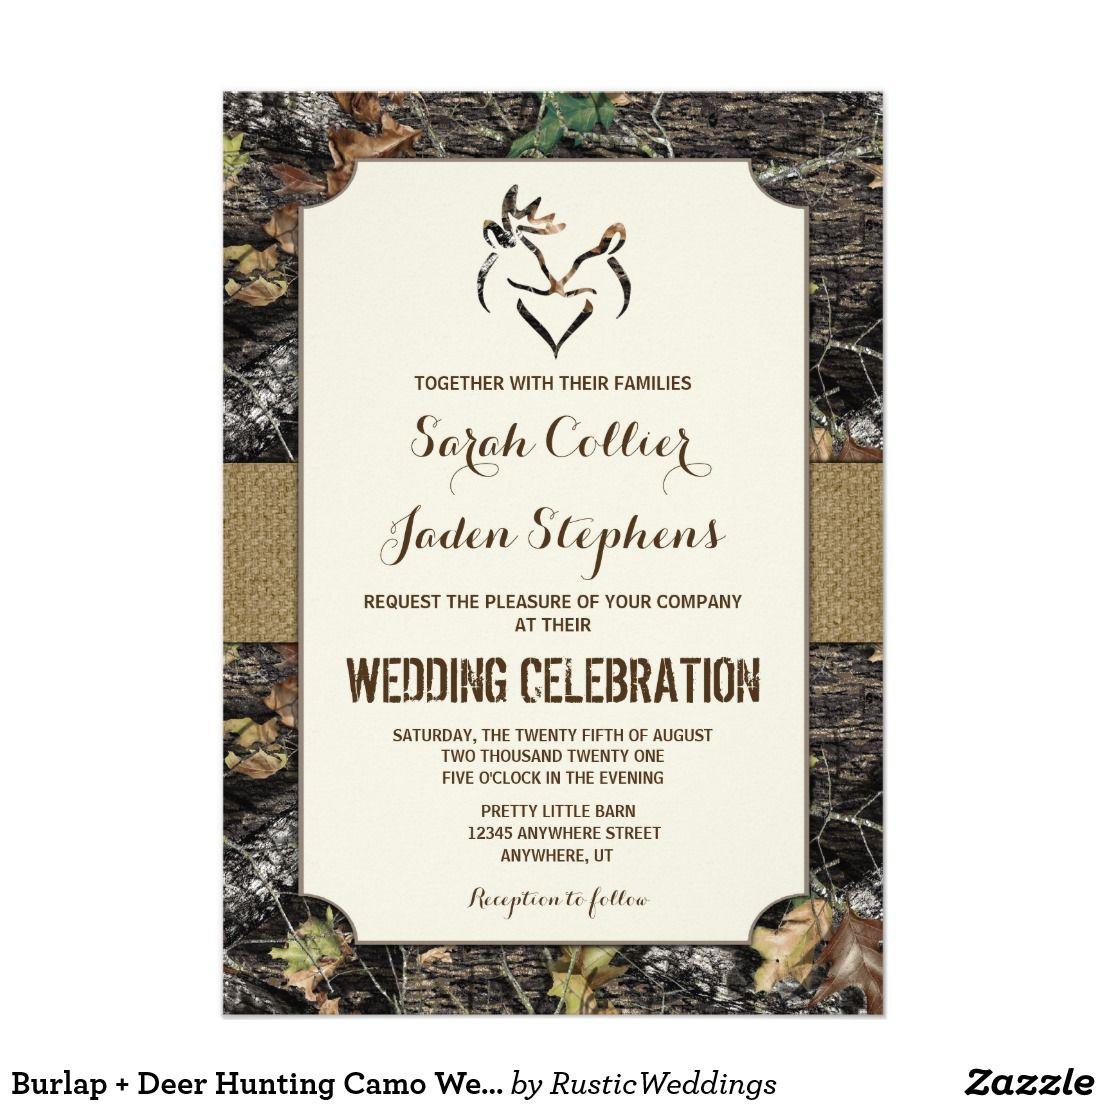 Burlap + Deer Hunting Camo Wedding Invitations   Camo wedding and ...